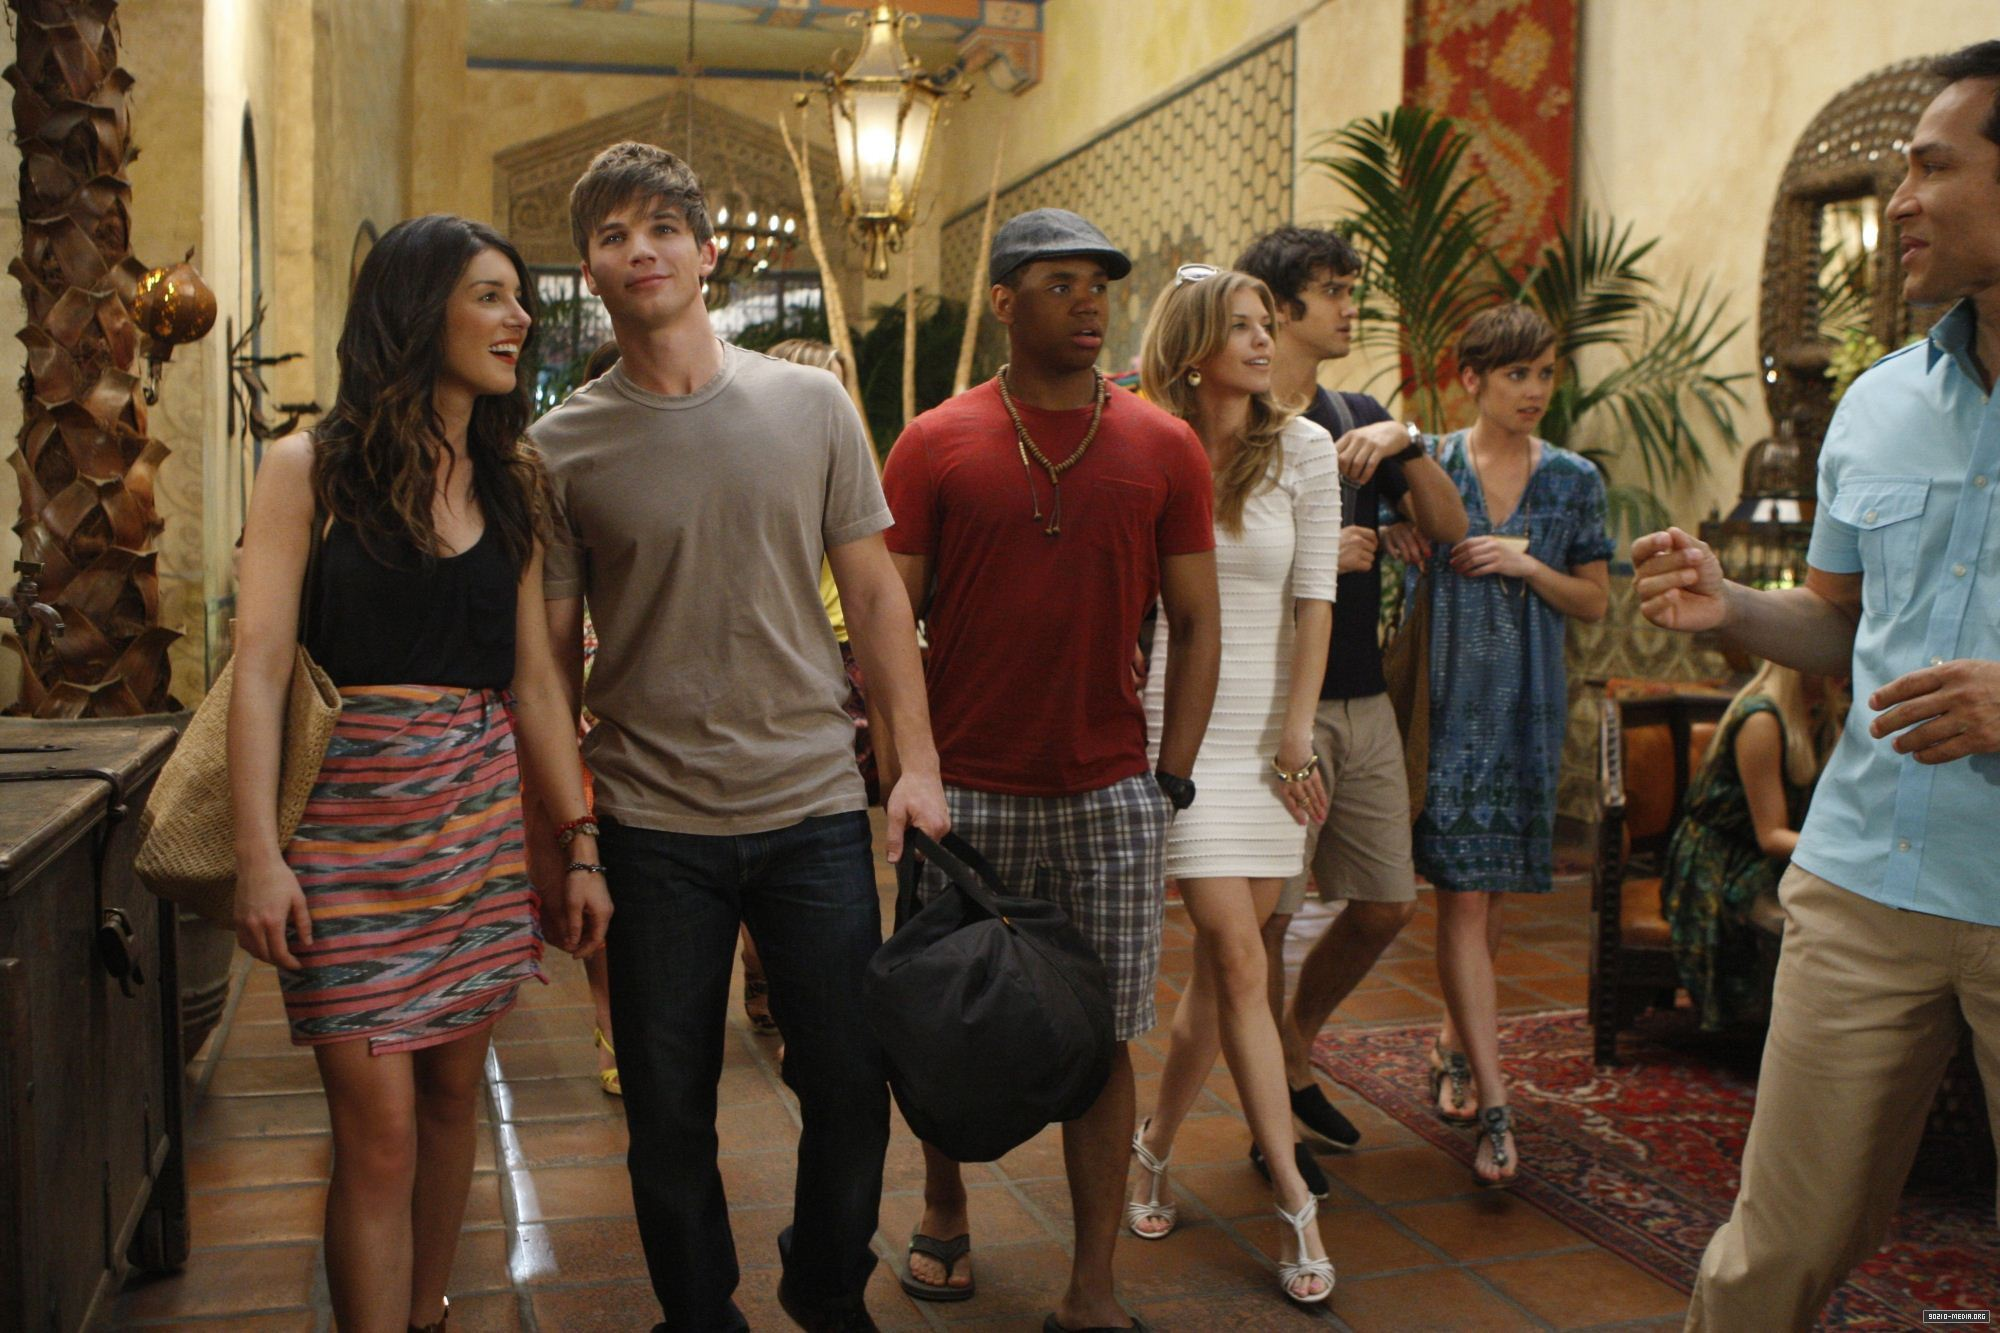 90210, teen drama